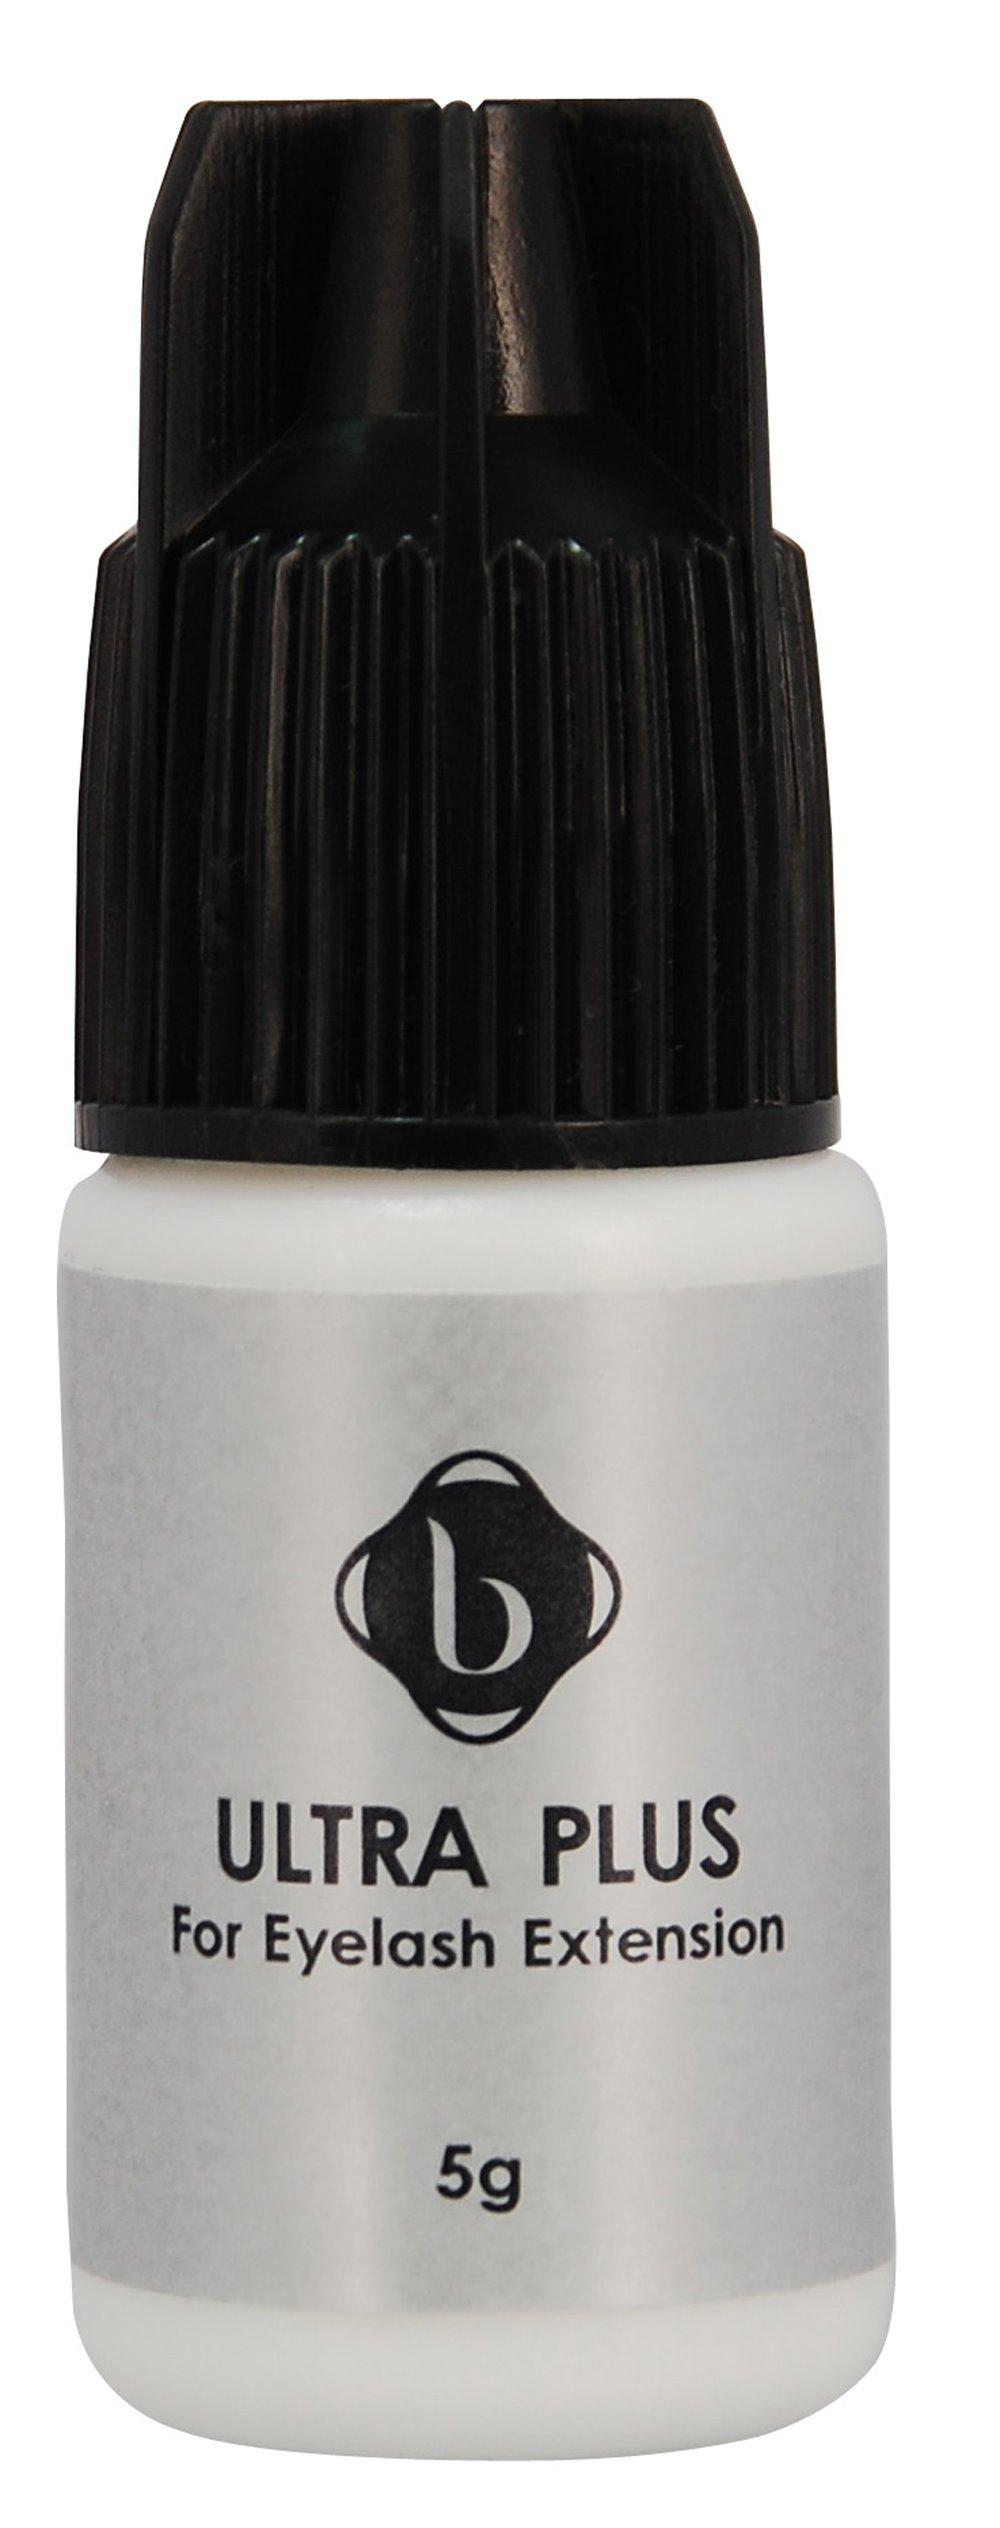 Blink Ultra Plus Eyelash Extension Glue Hair Extensions Richardson